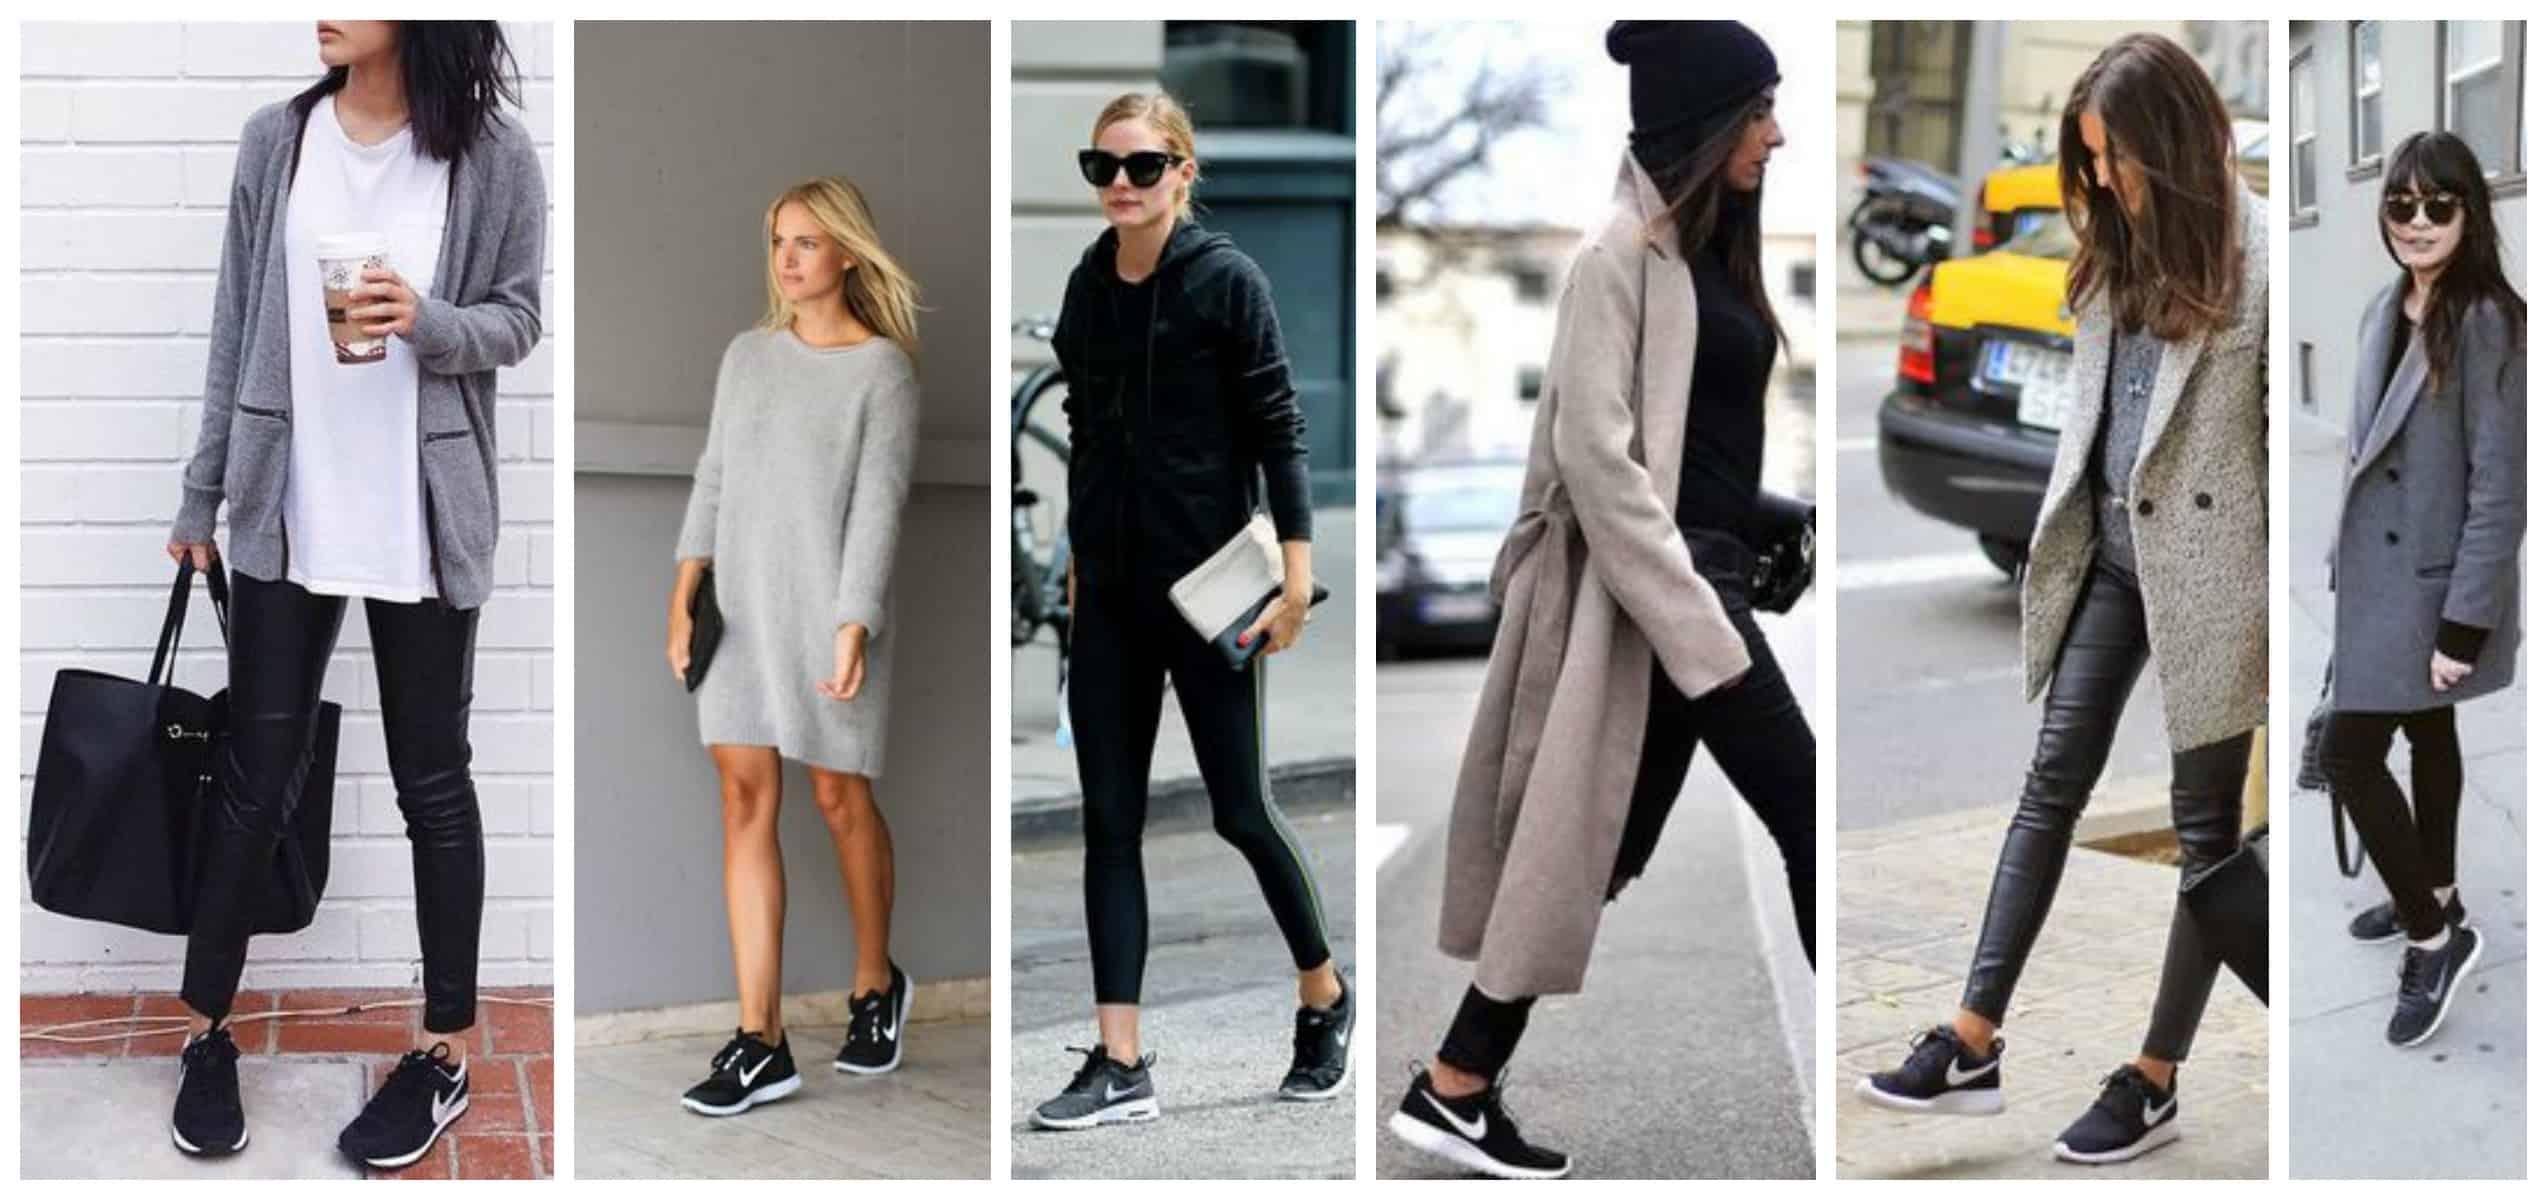 2017 trend alert black sneakers the fashion tag blog. Black Bedroom Furniture Sets. Home Design Ideas